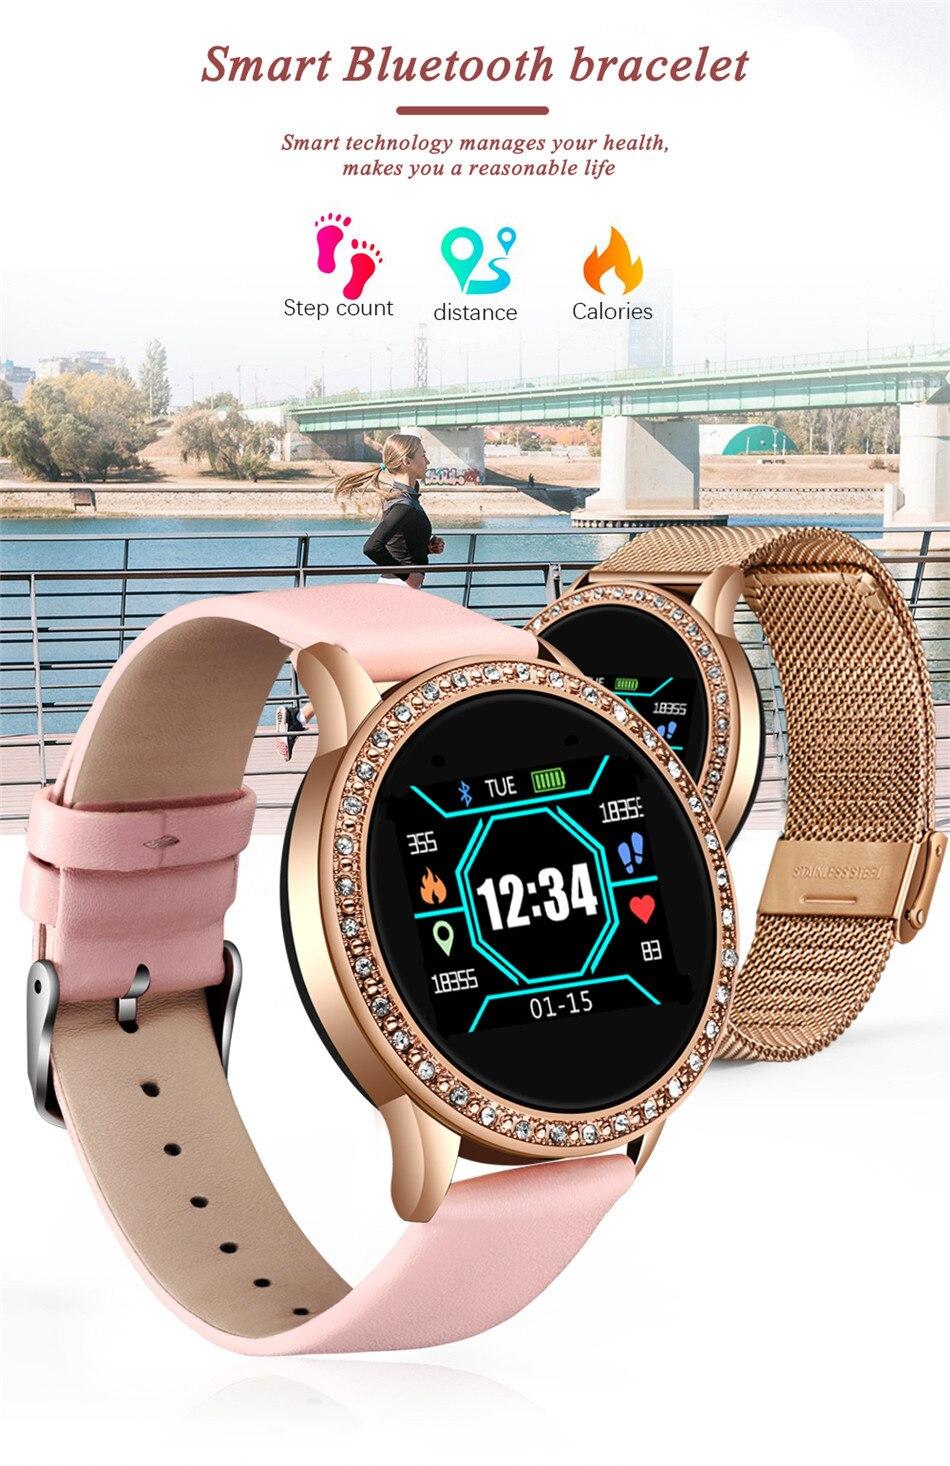 Hf7c1a4815b05414abfbcf9369bf18fc5K LIGE 2020 New Smart Watch Women Men Heart Rate Blood Pressure Sport Multi-function Watch fitness tracker Fashion smartwatch+Box